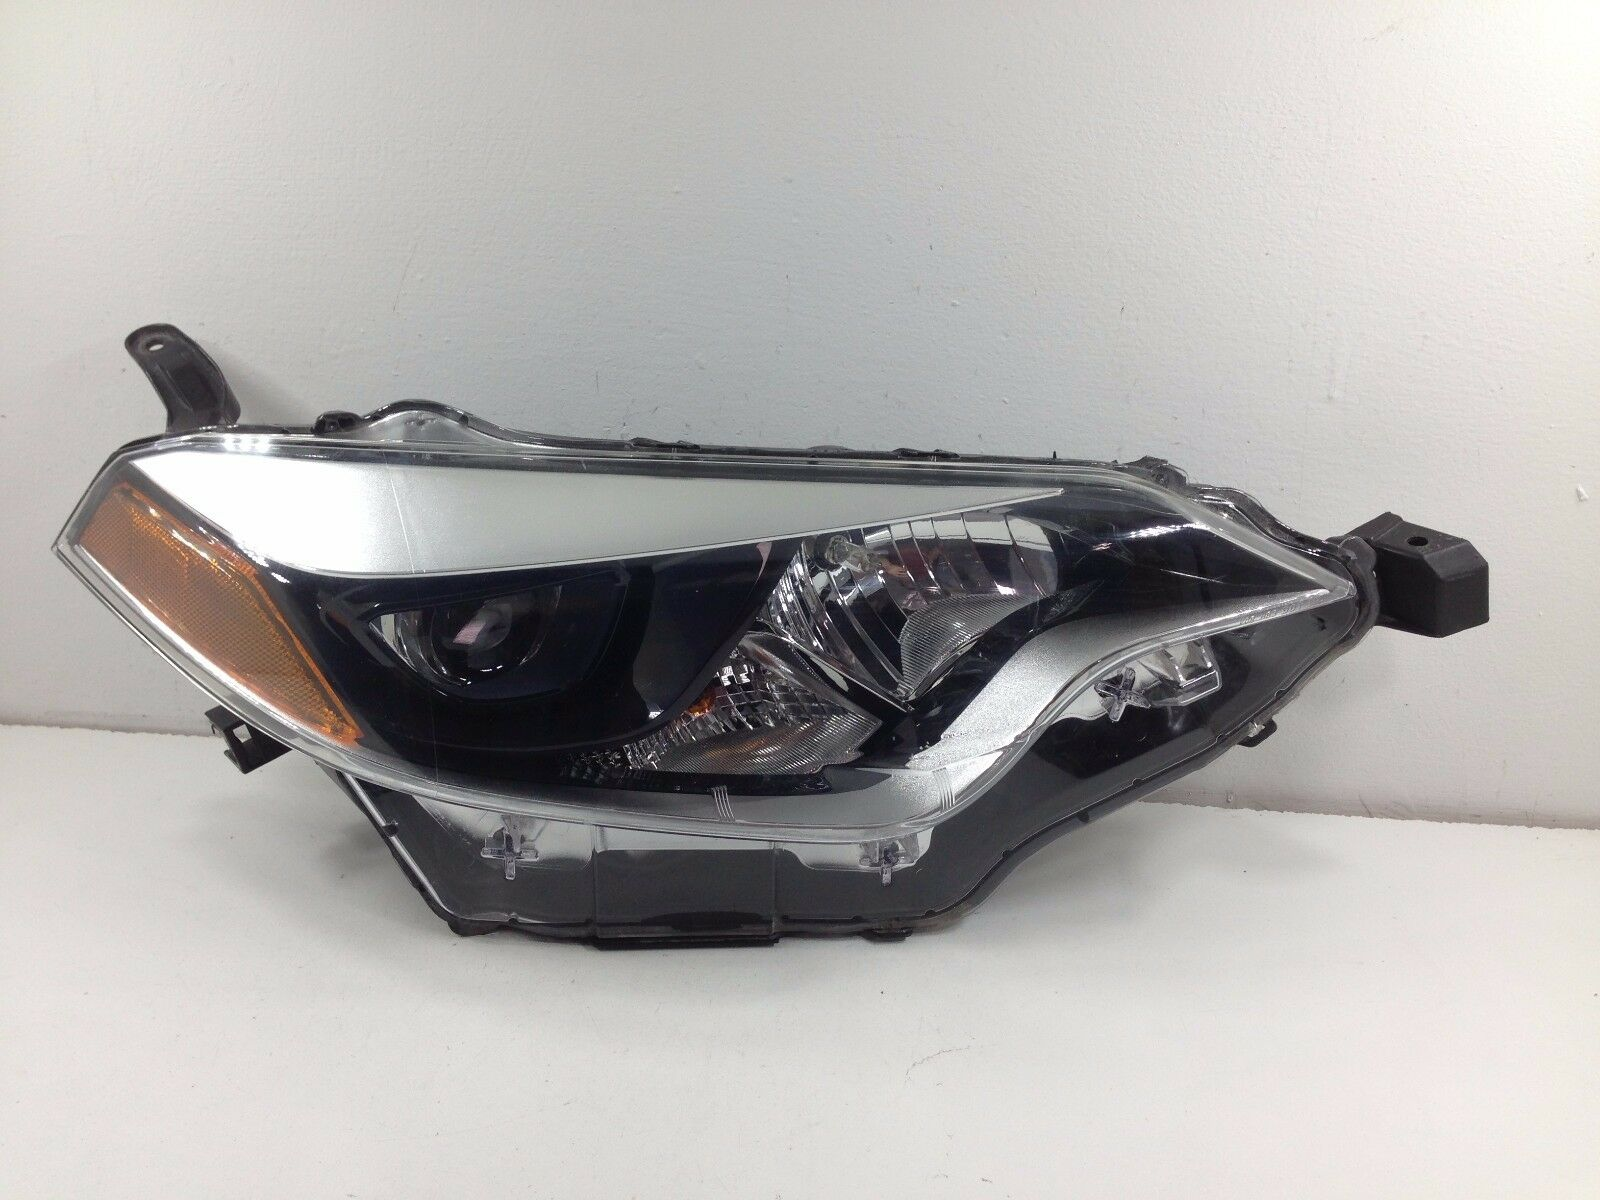 2014 toyota corolla headlight 120 volt electric water heater